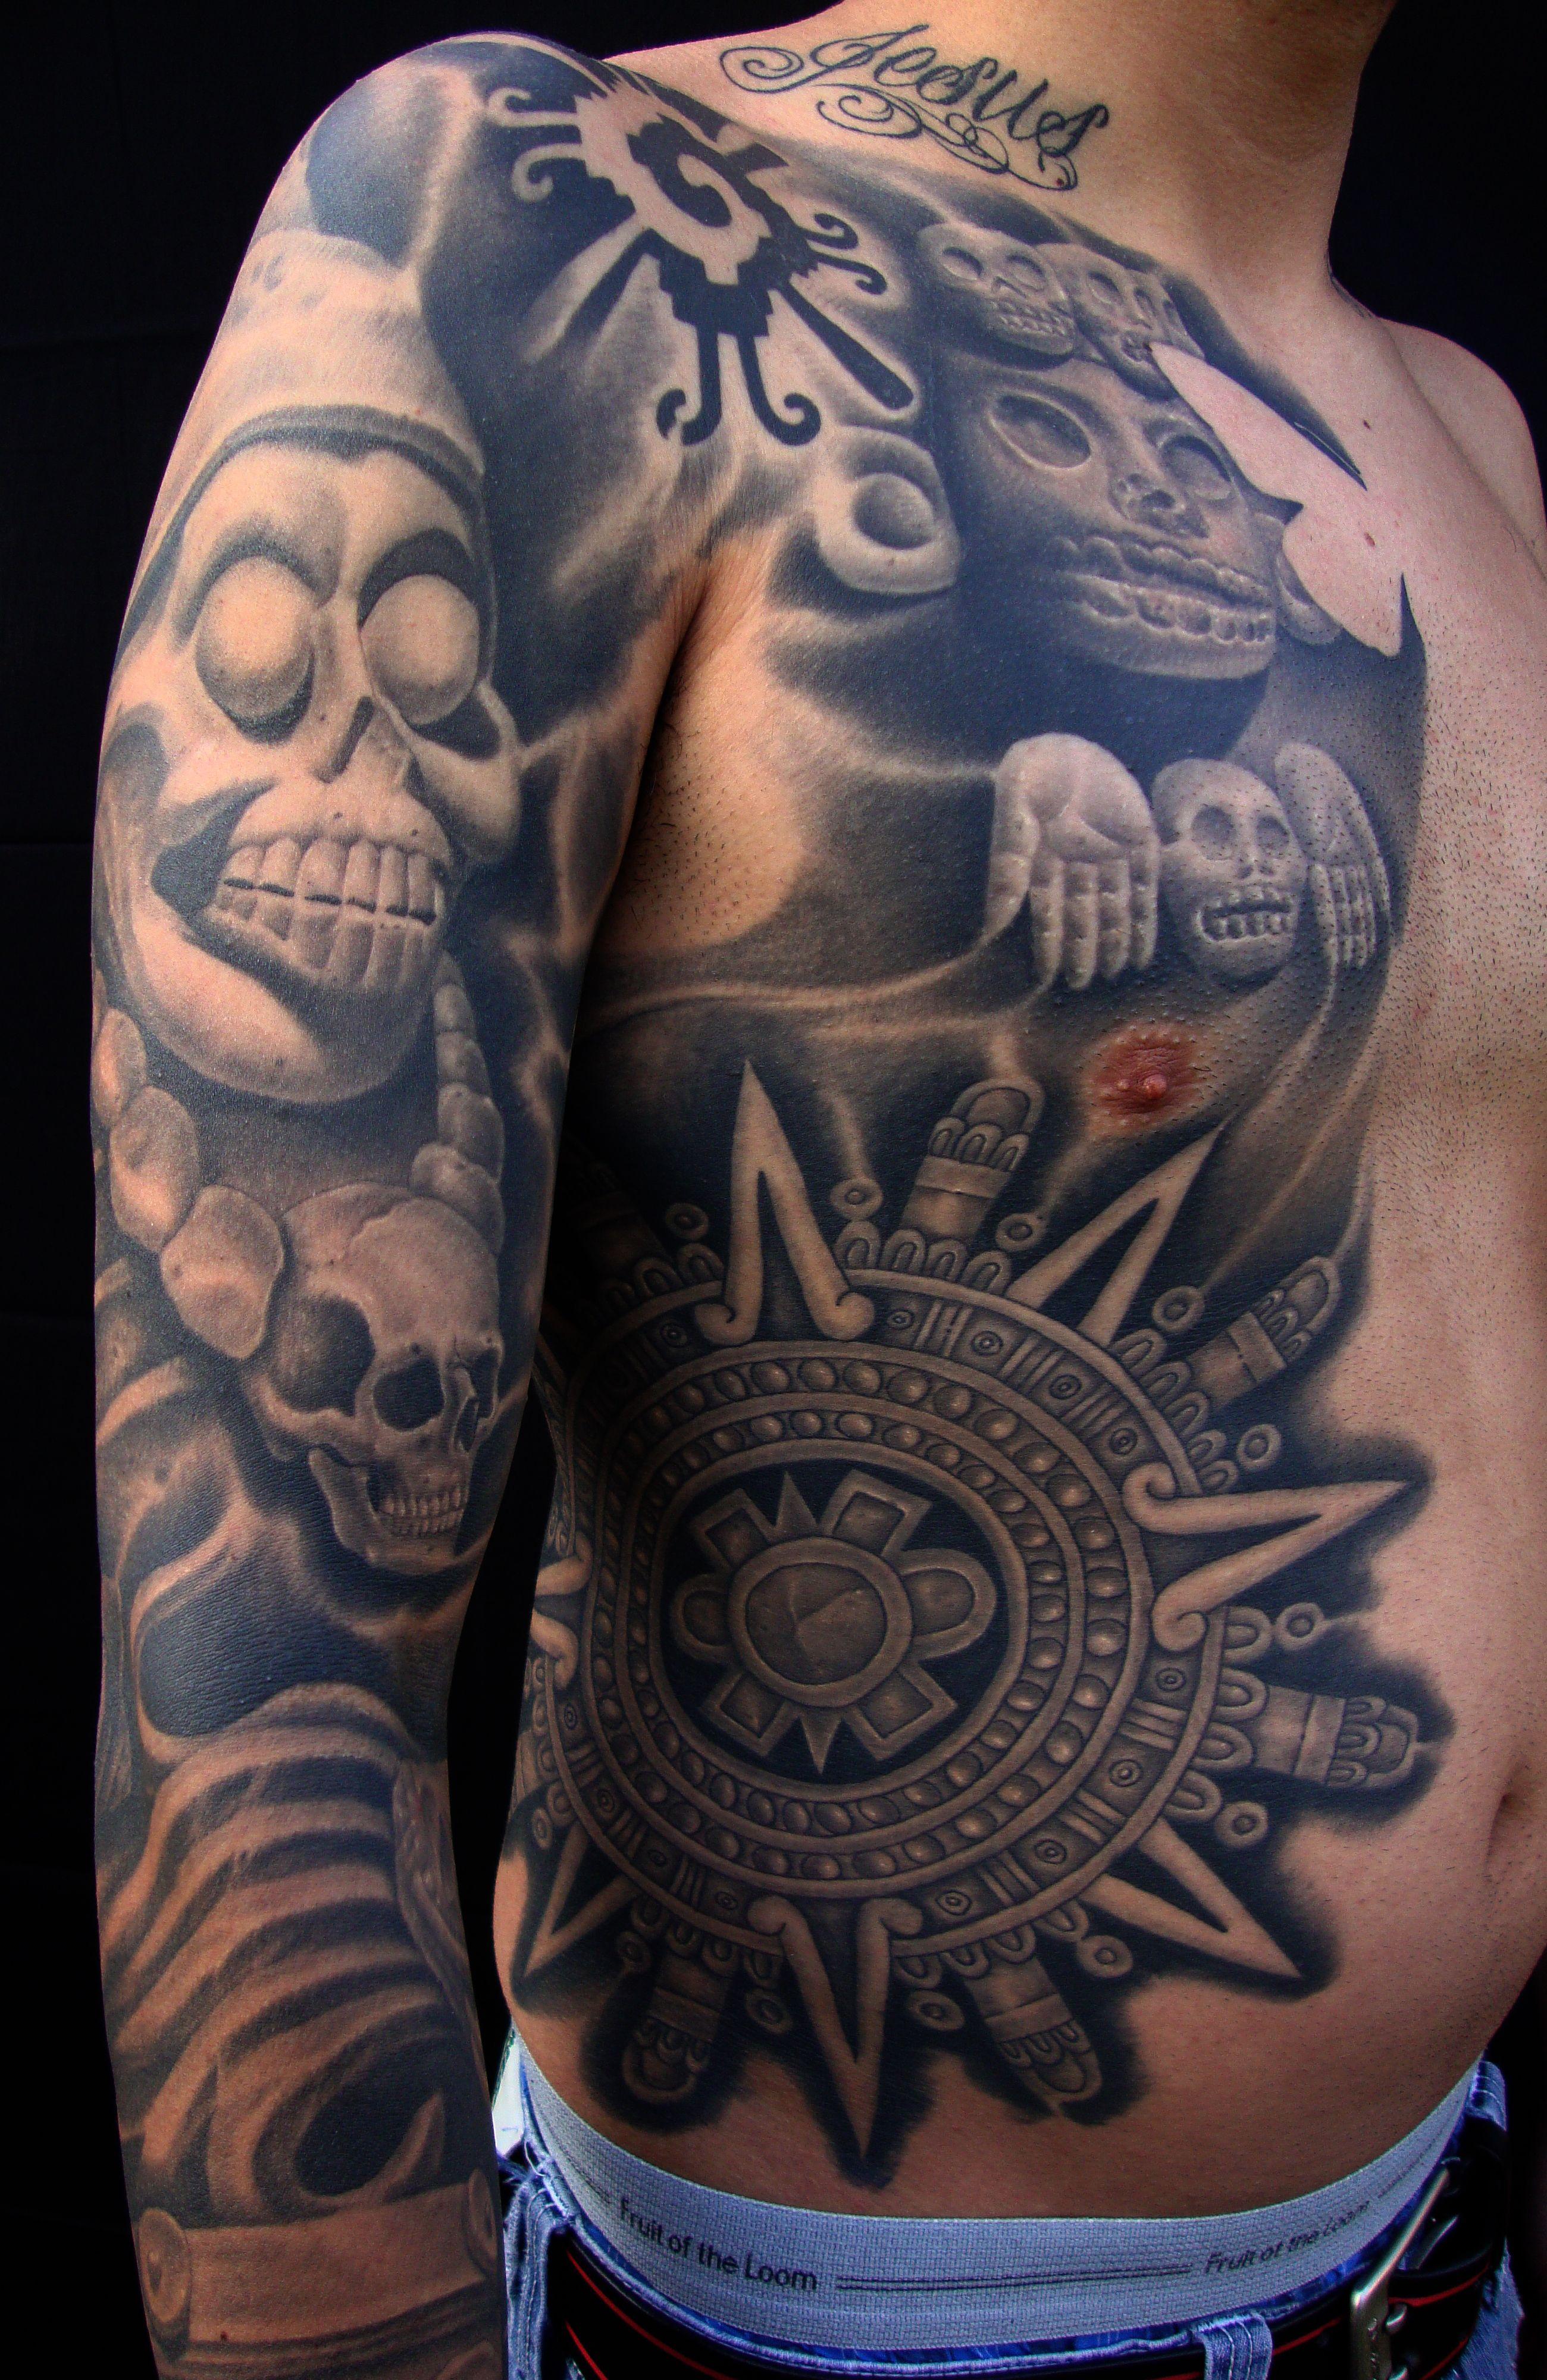 Koi Fish Tattoo Half Sleeve Stencil Ebcfcfbbfbbec